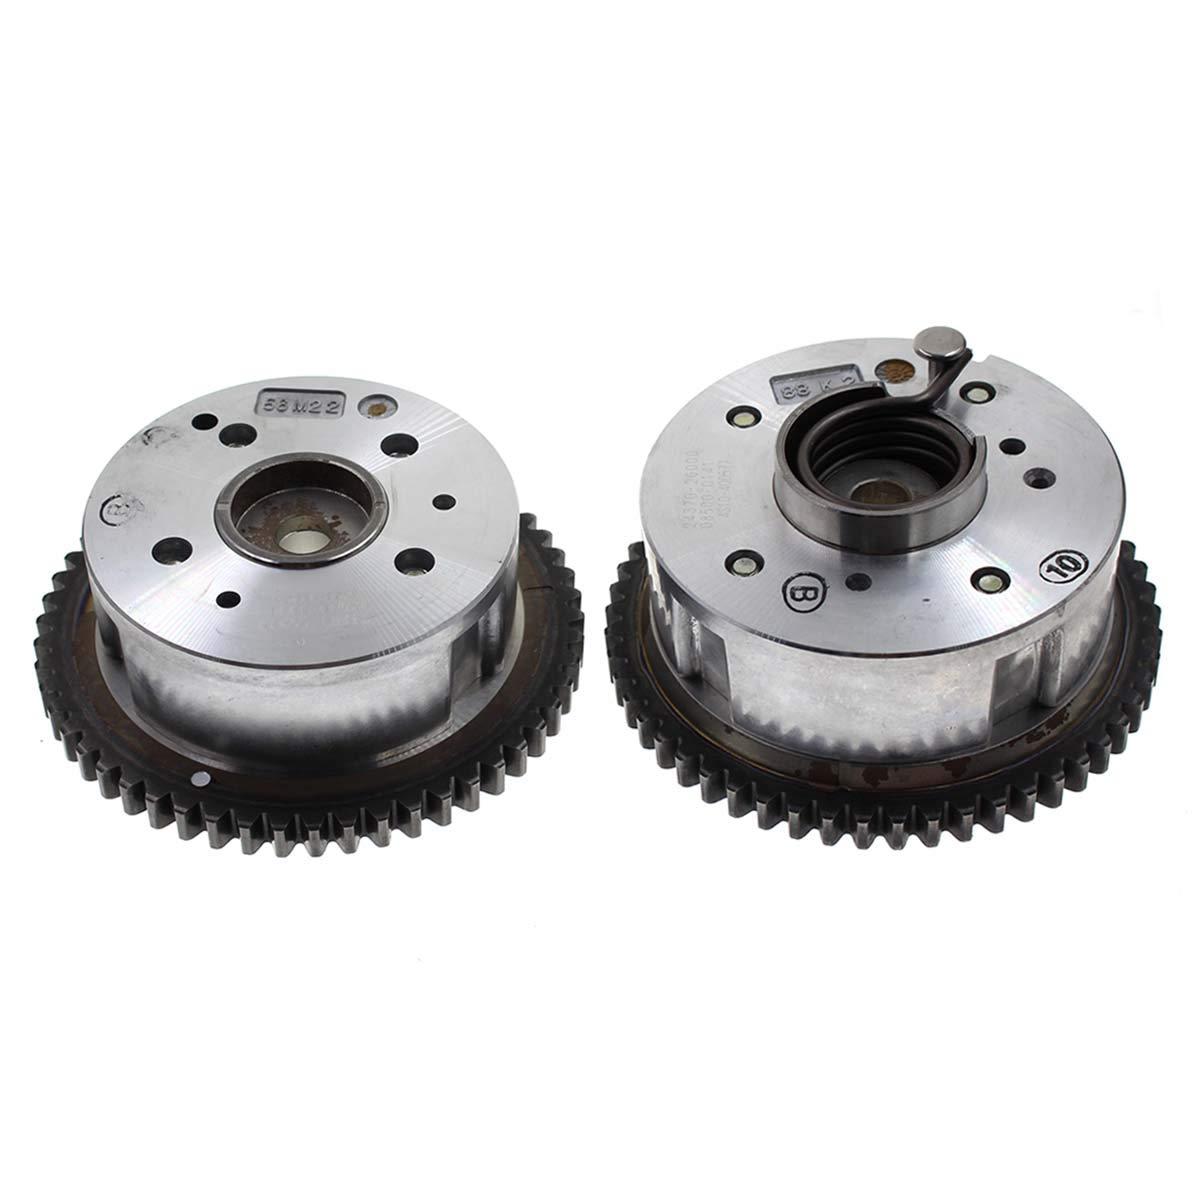 MOTOALL 2pcs Intake Exhaust Camshaft Gear CVVT for 08-14 Hyundai Kia 2.4L for Tucson Forte Optima Rondo 24350-25000 24370-2G000